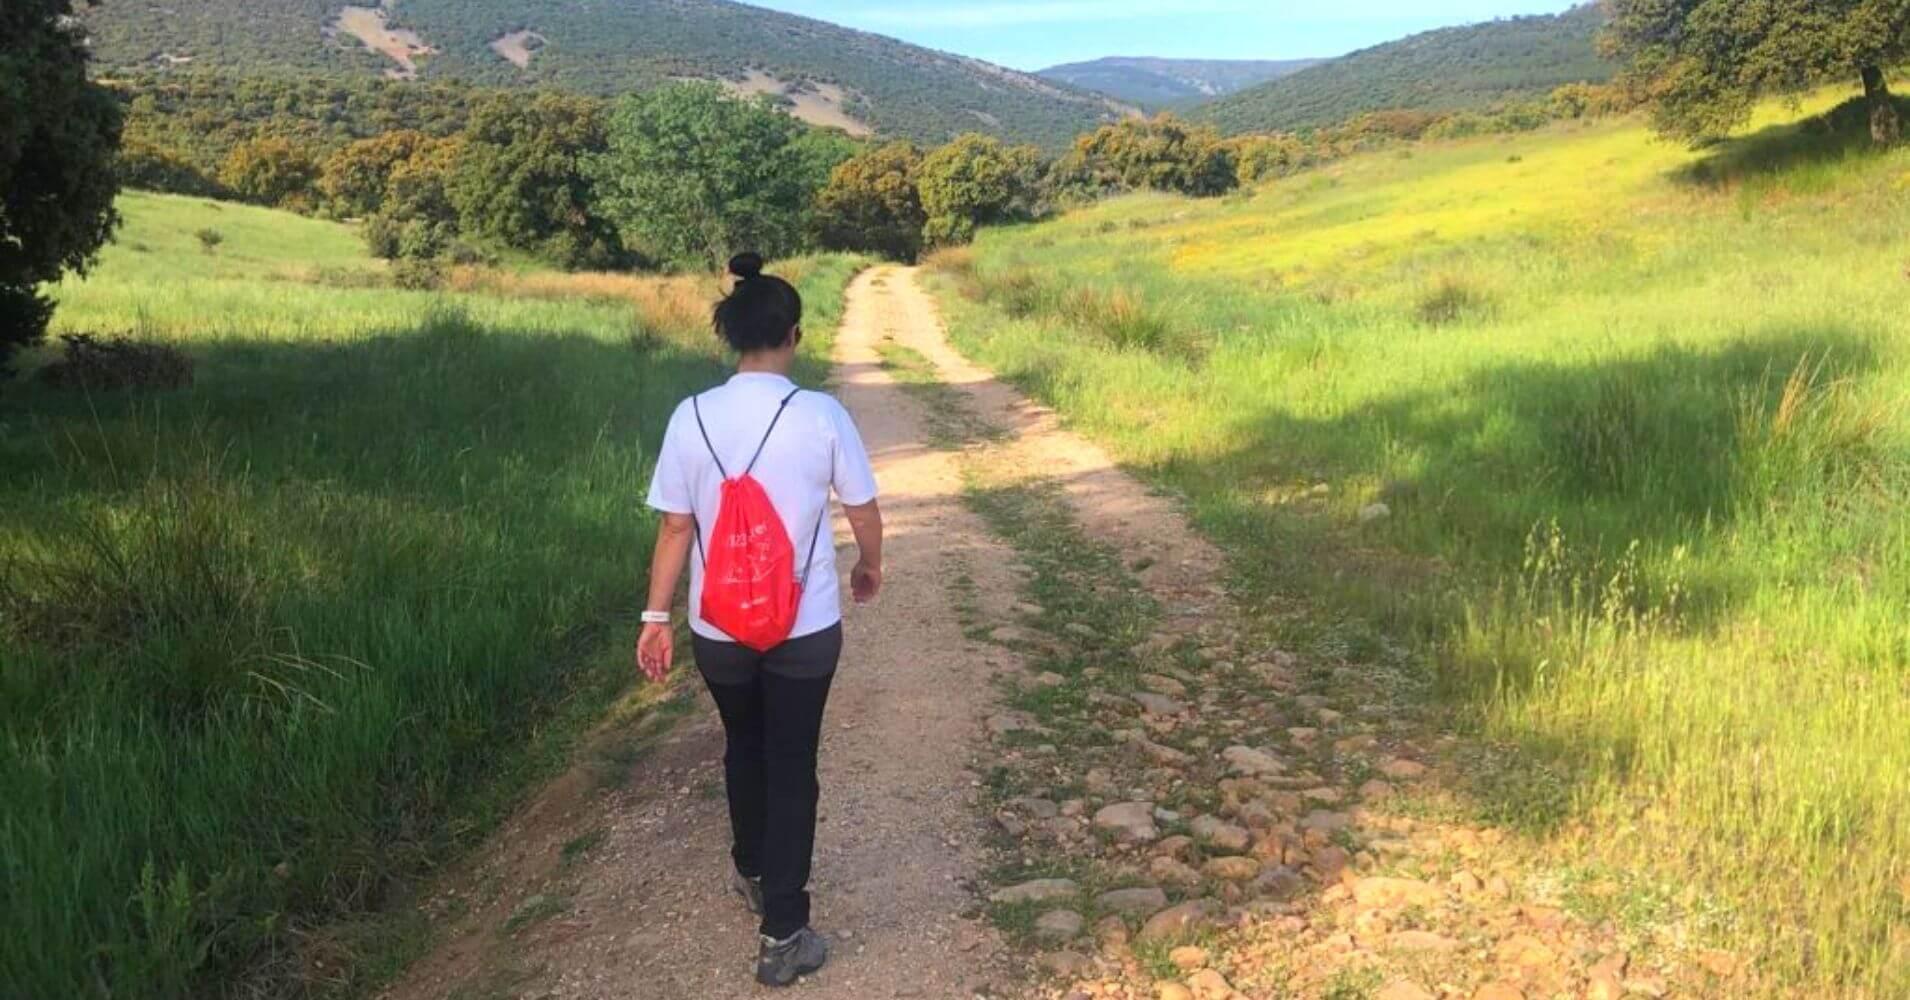 Paseo por Malamoneda. Hontanar, Toledo. Castilla La Mancha.